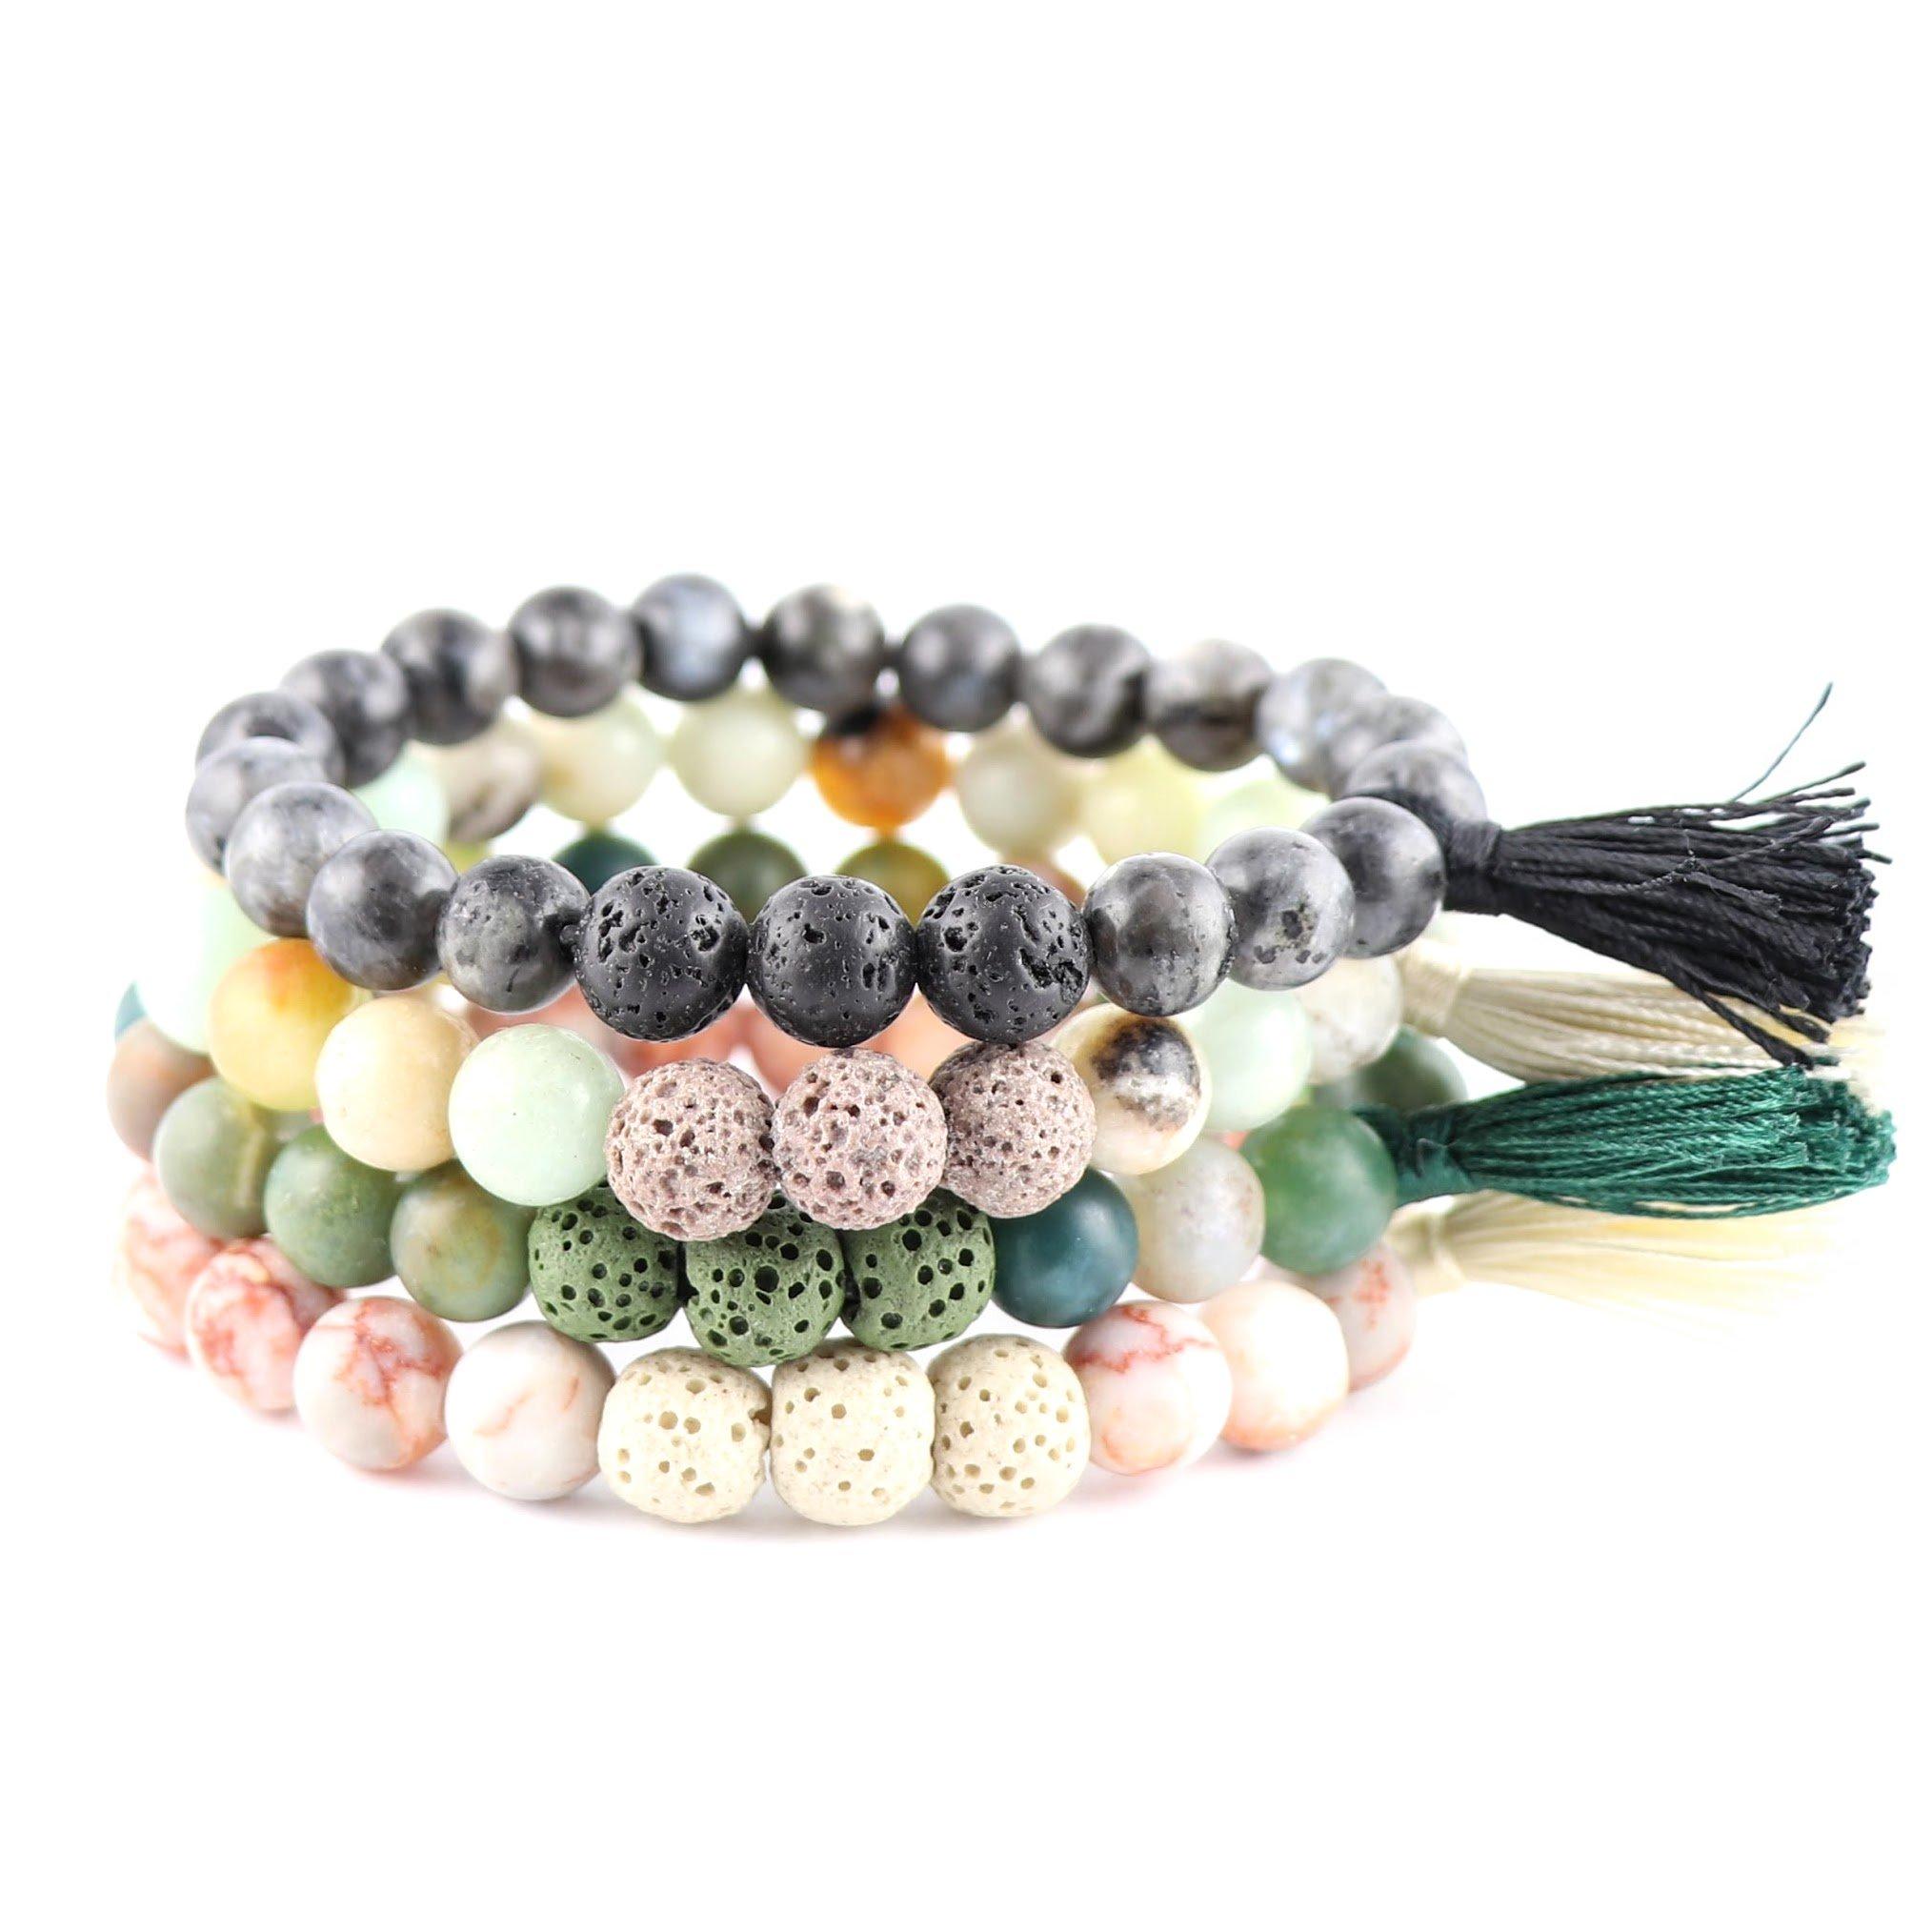 New Lava Rock Natural Stone Essential Oil Diffuser Tassel Bracelet | Distance Friendship Mala Tibetan Praying Beaded Bracelet Jewelry Box (Medium-Large, 4 Pcs Set - Heal & Let Go. Black, Green, Beige)